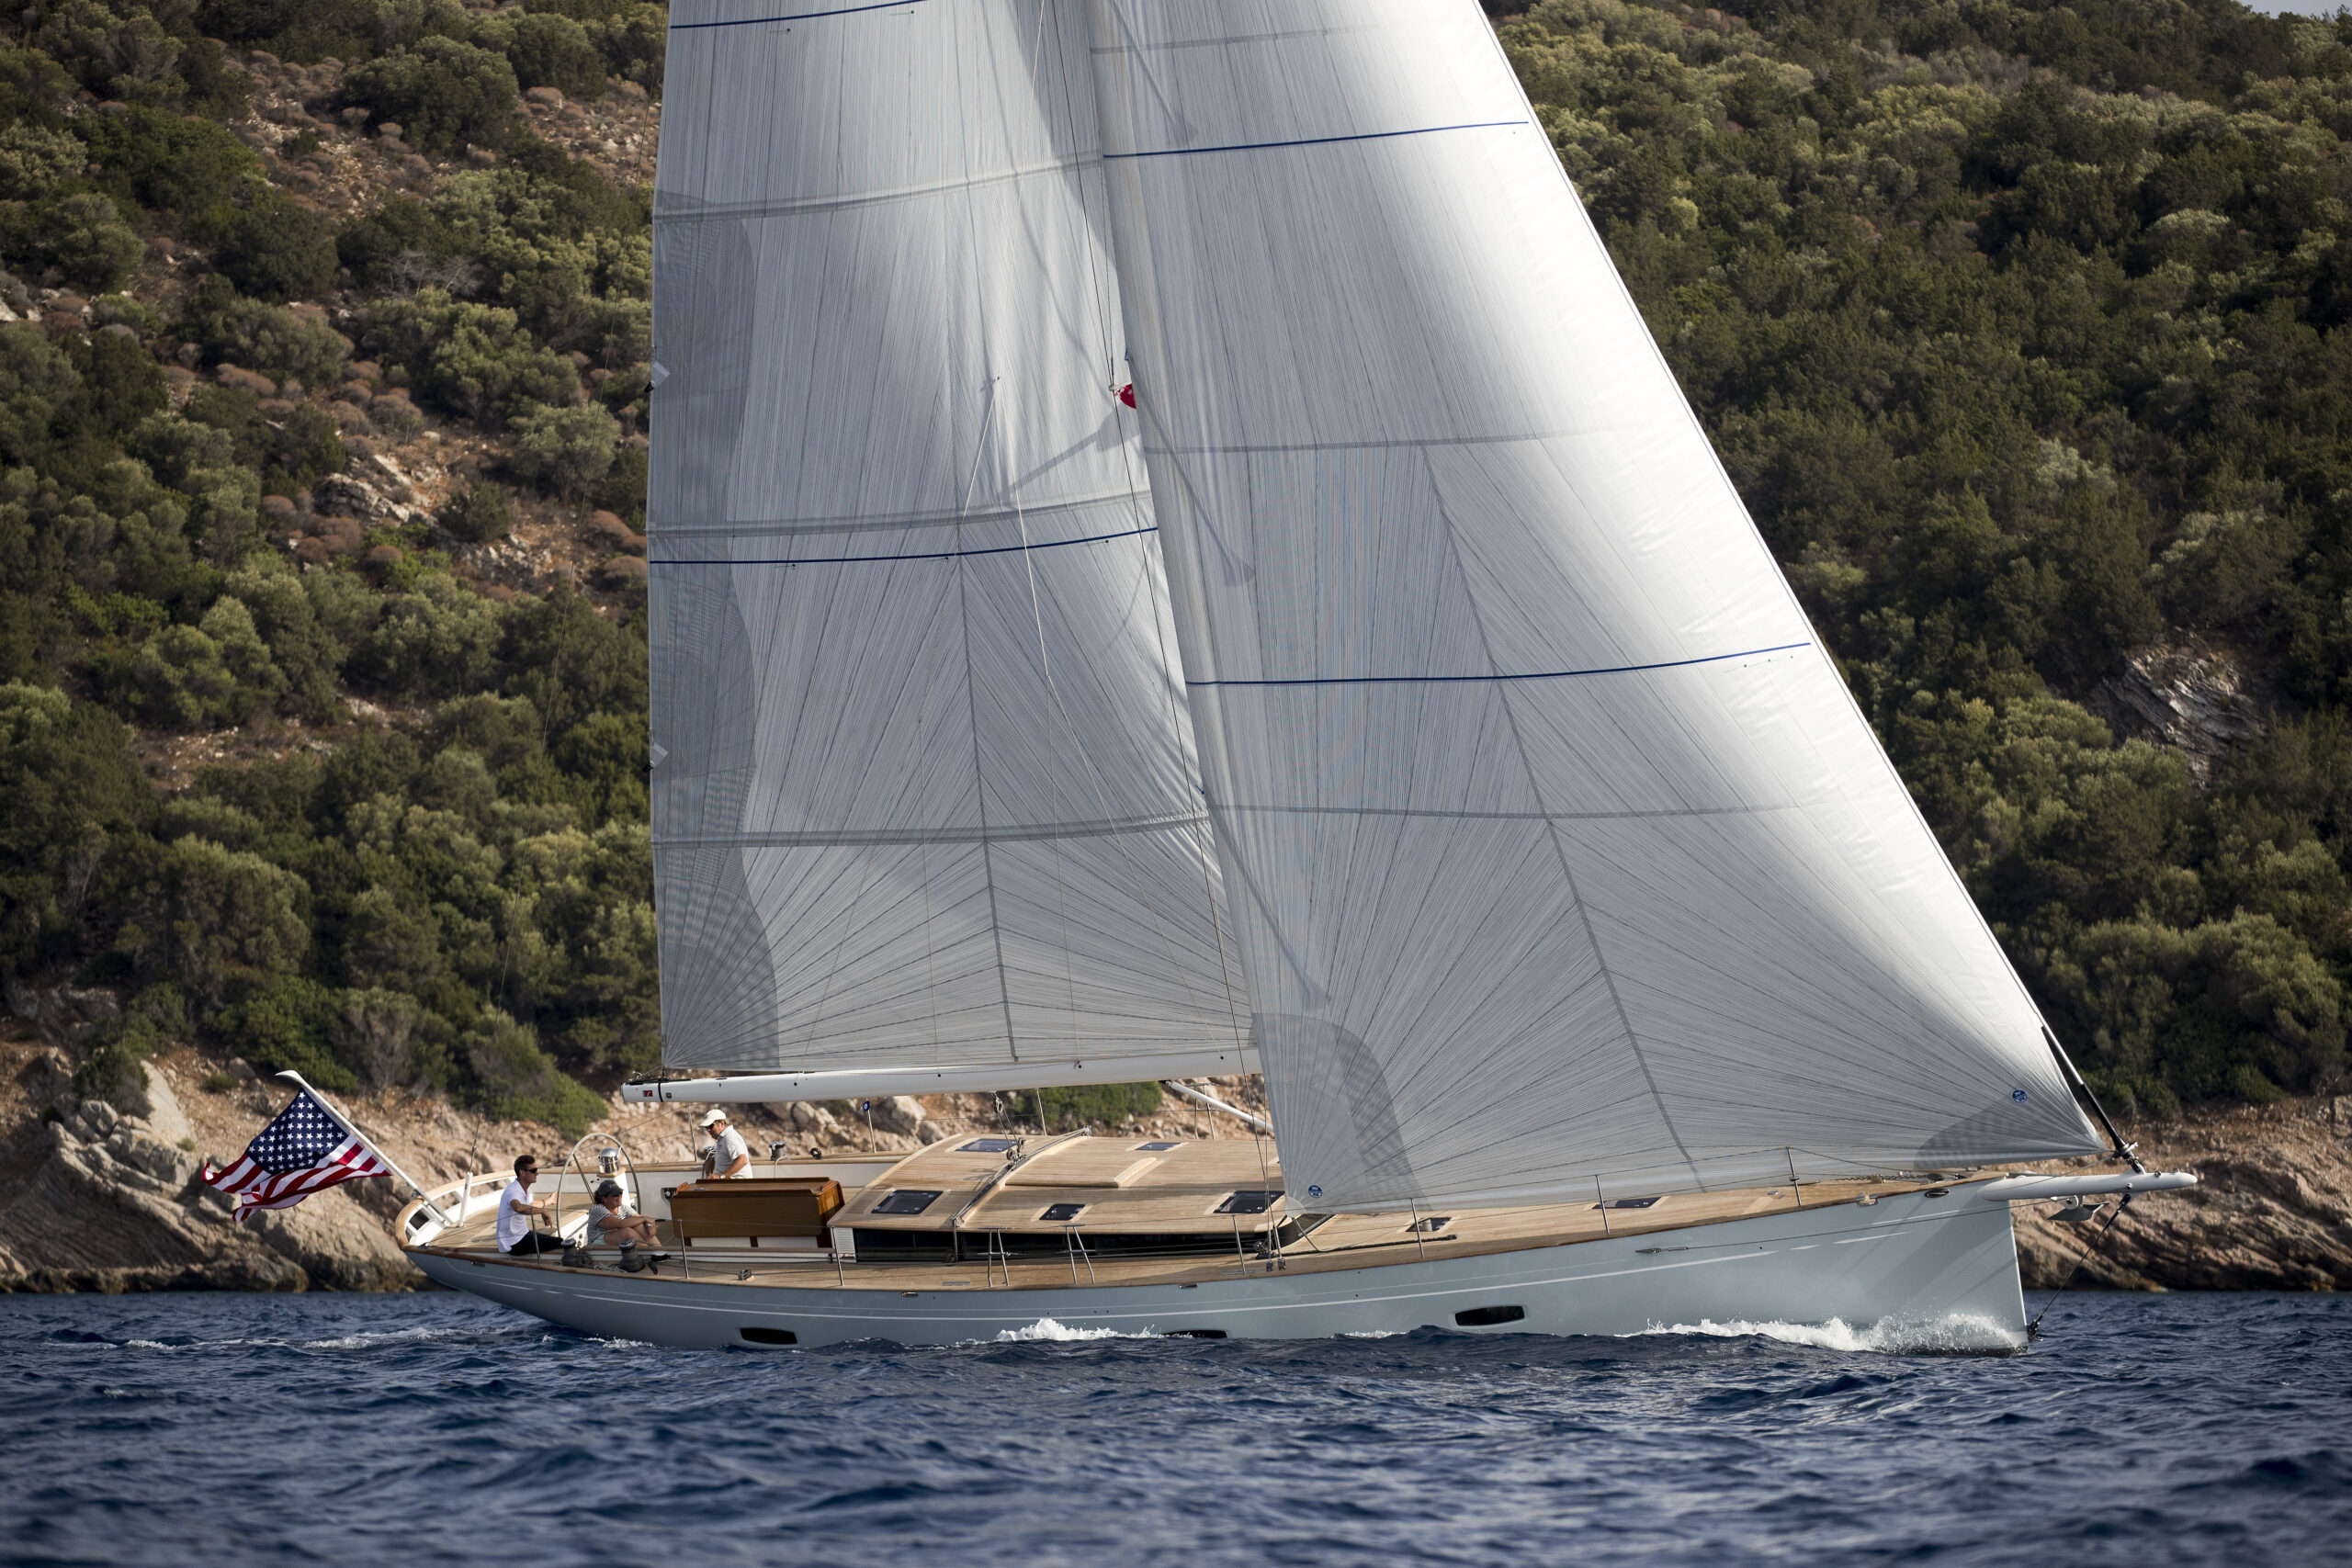 PC55 Sister vessel sailing